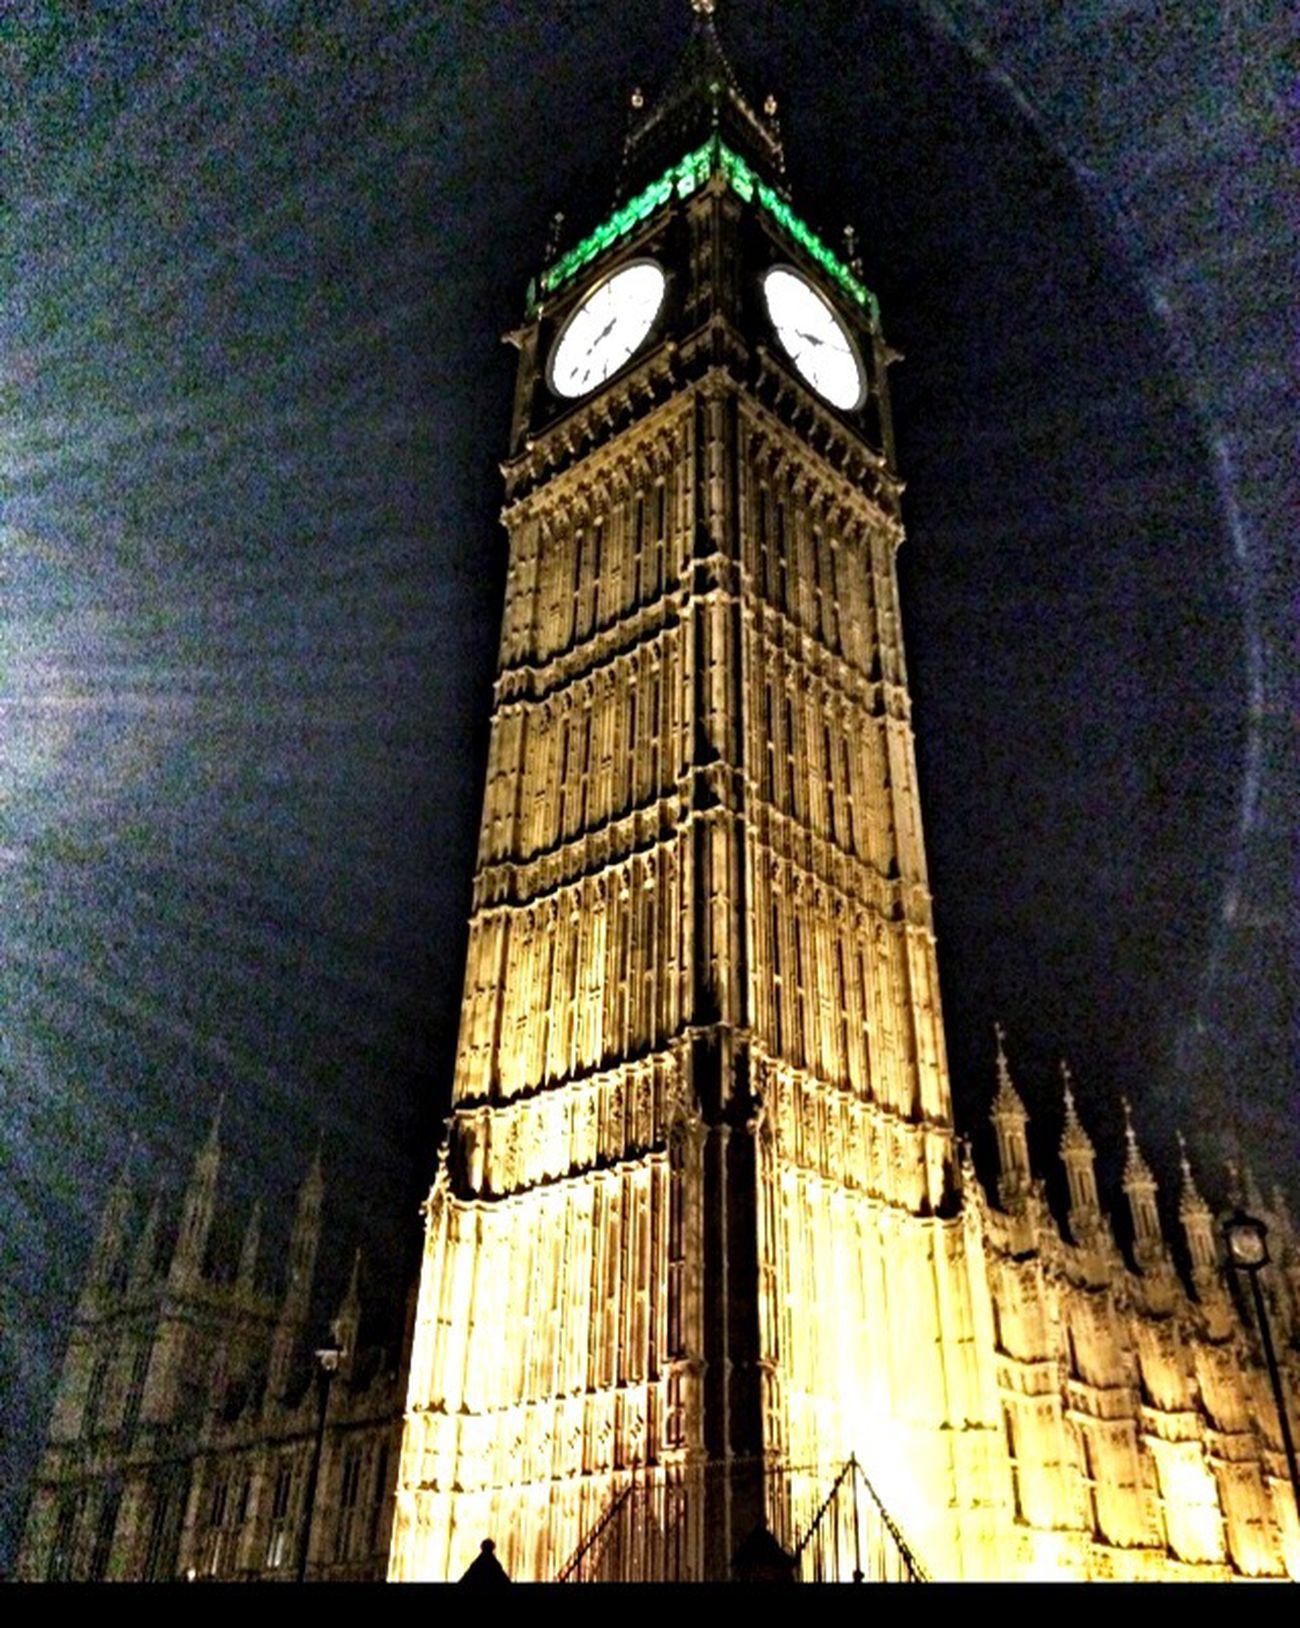 Architecture Illuminated Clock Tower Night IPhoneography IPhone Photography Iphonephotography Iphone Eyeem Architecture Historical Building Archiporn Tower Big Ben